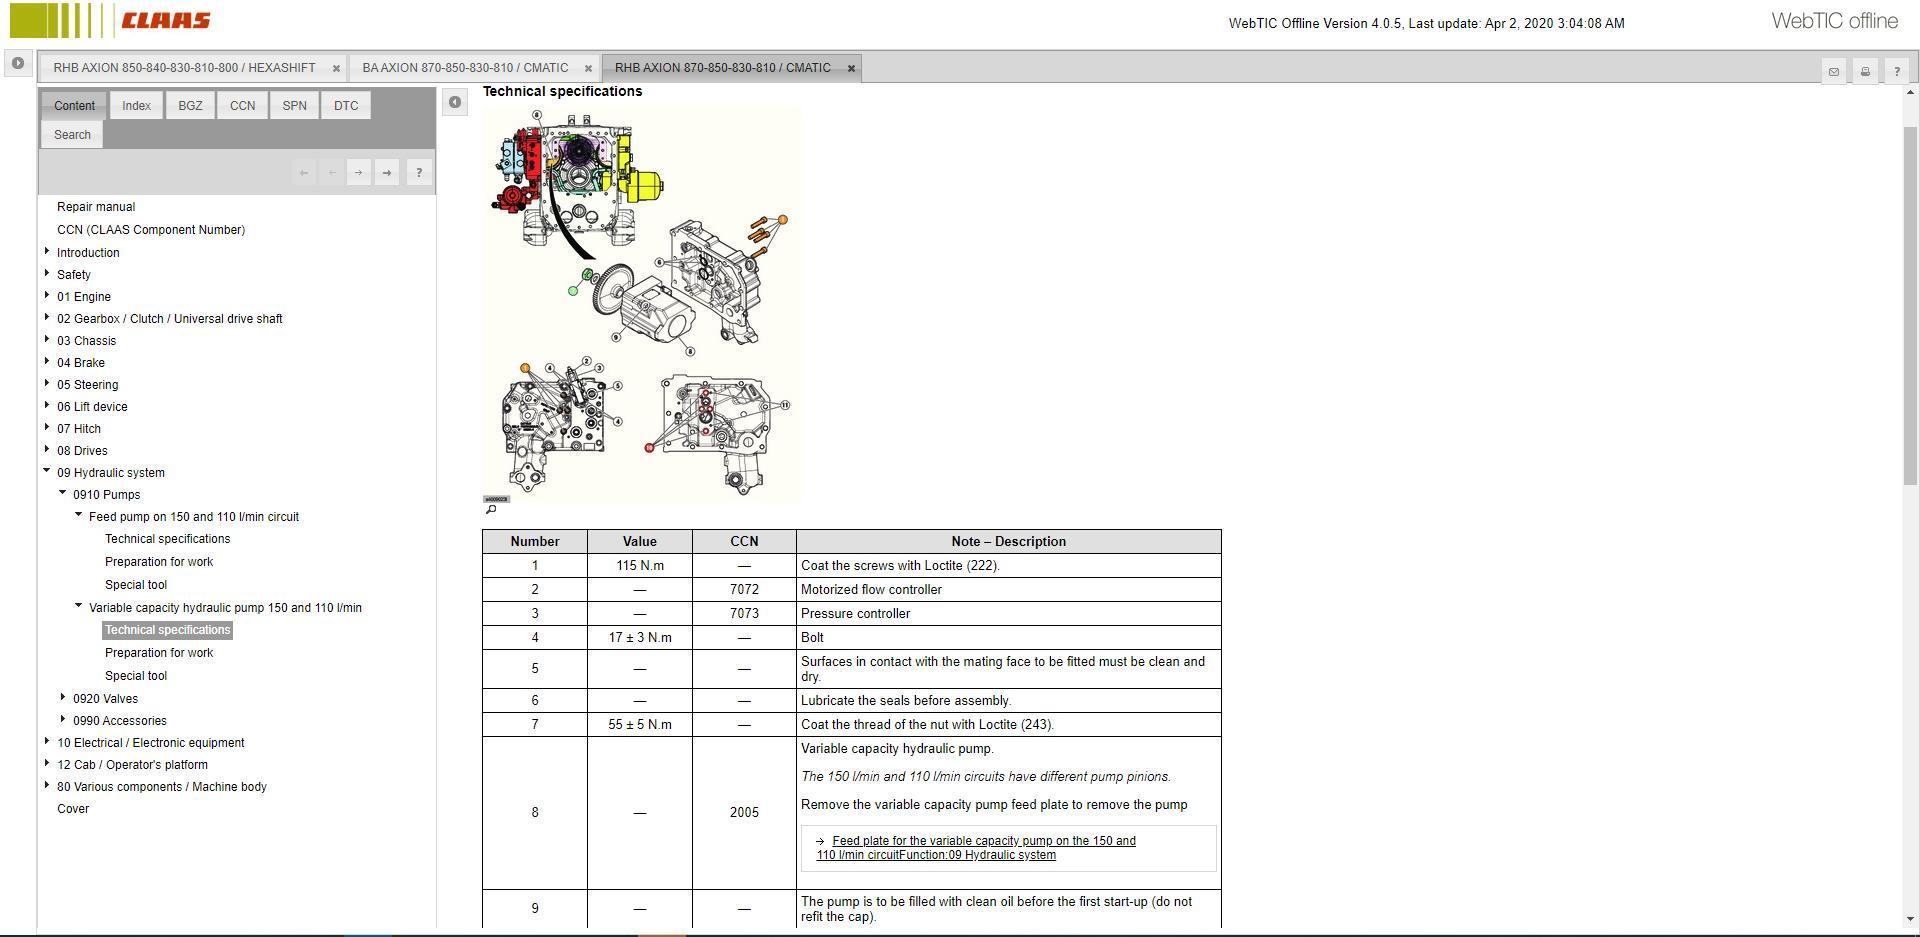 CLAASWebTICOffline2020RepairandServiceDocumentation11